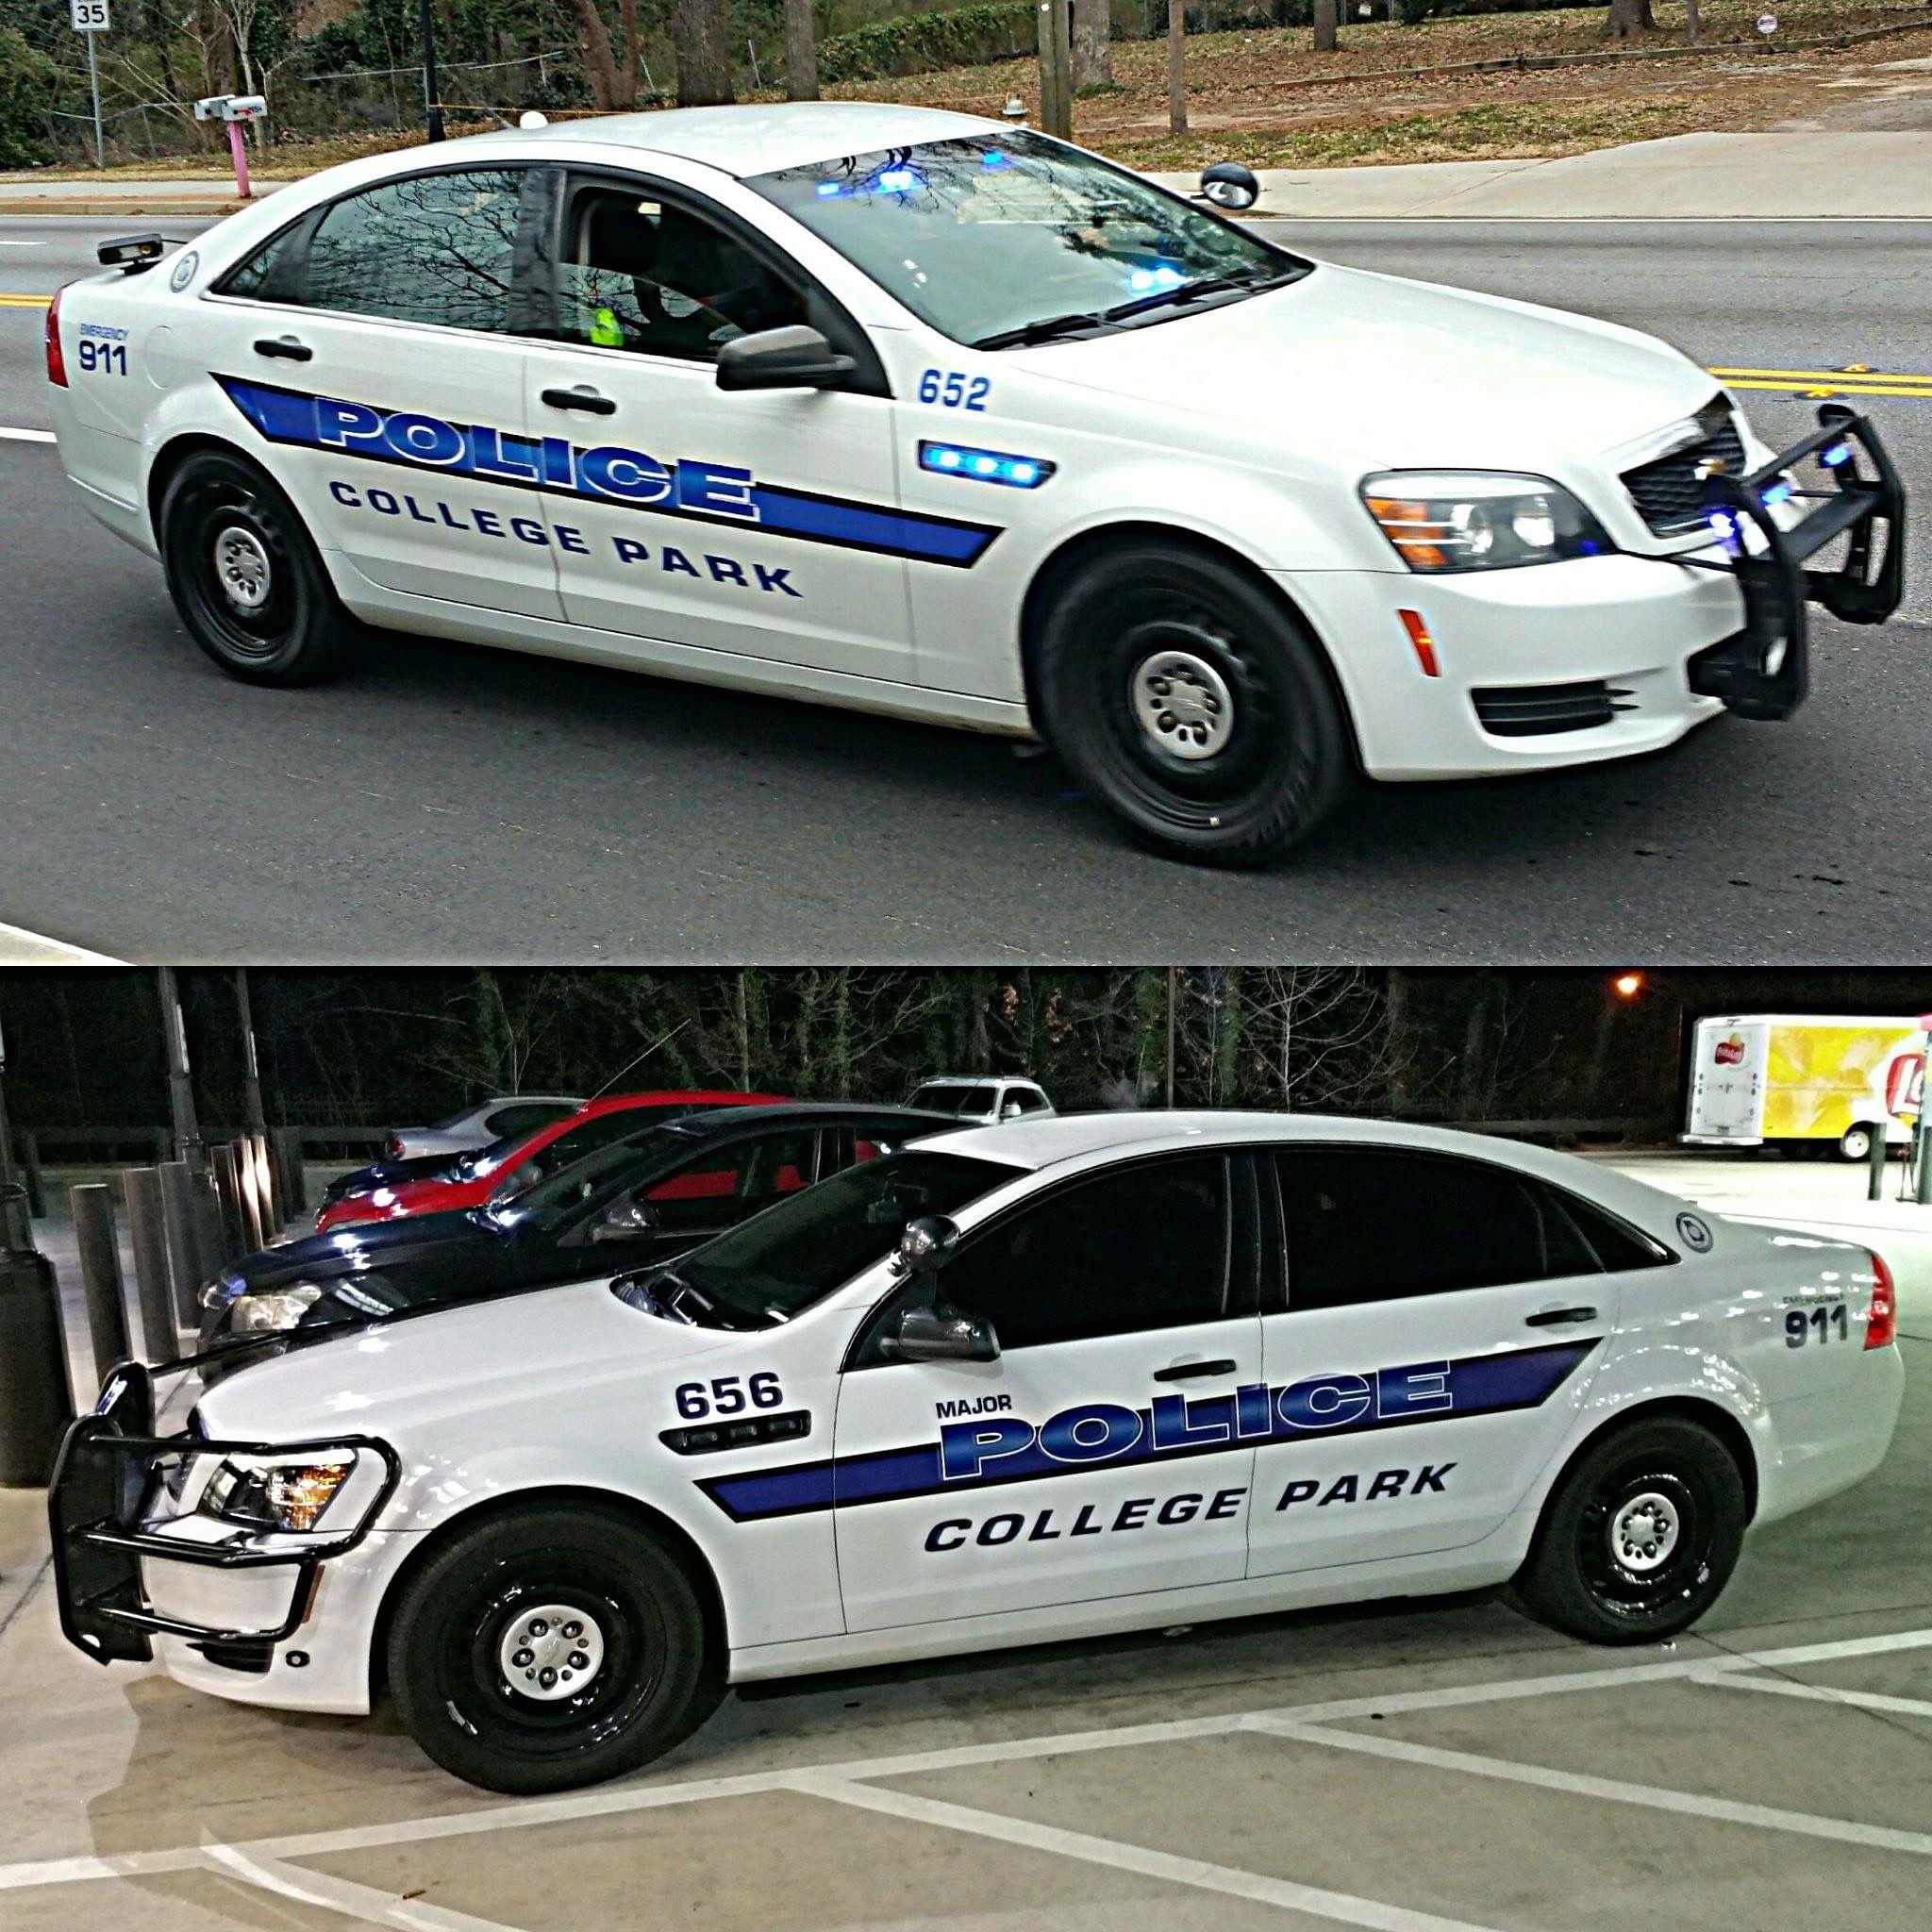 College Park Police Department Georgia New Chevrolet Caprice Patrol Car This